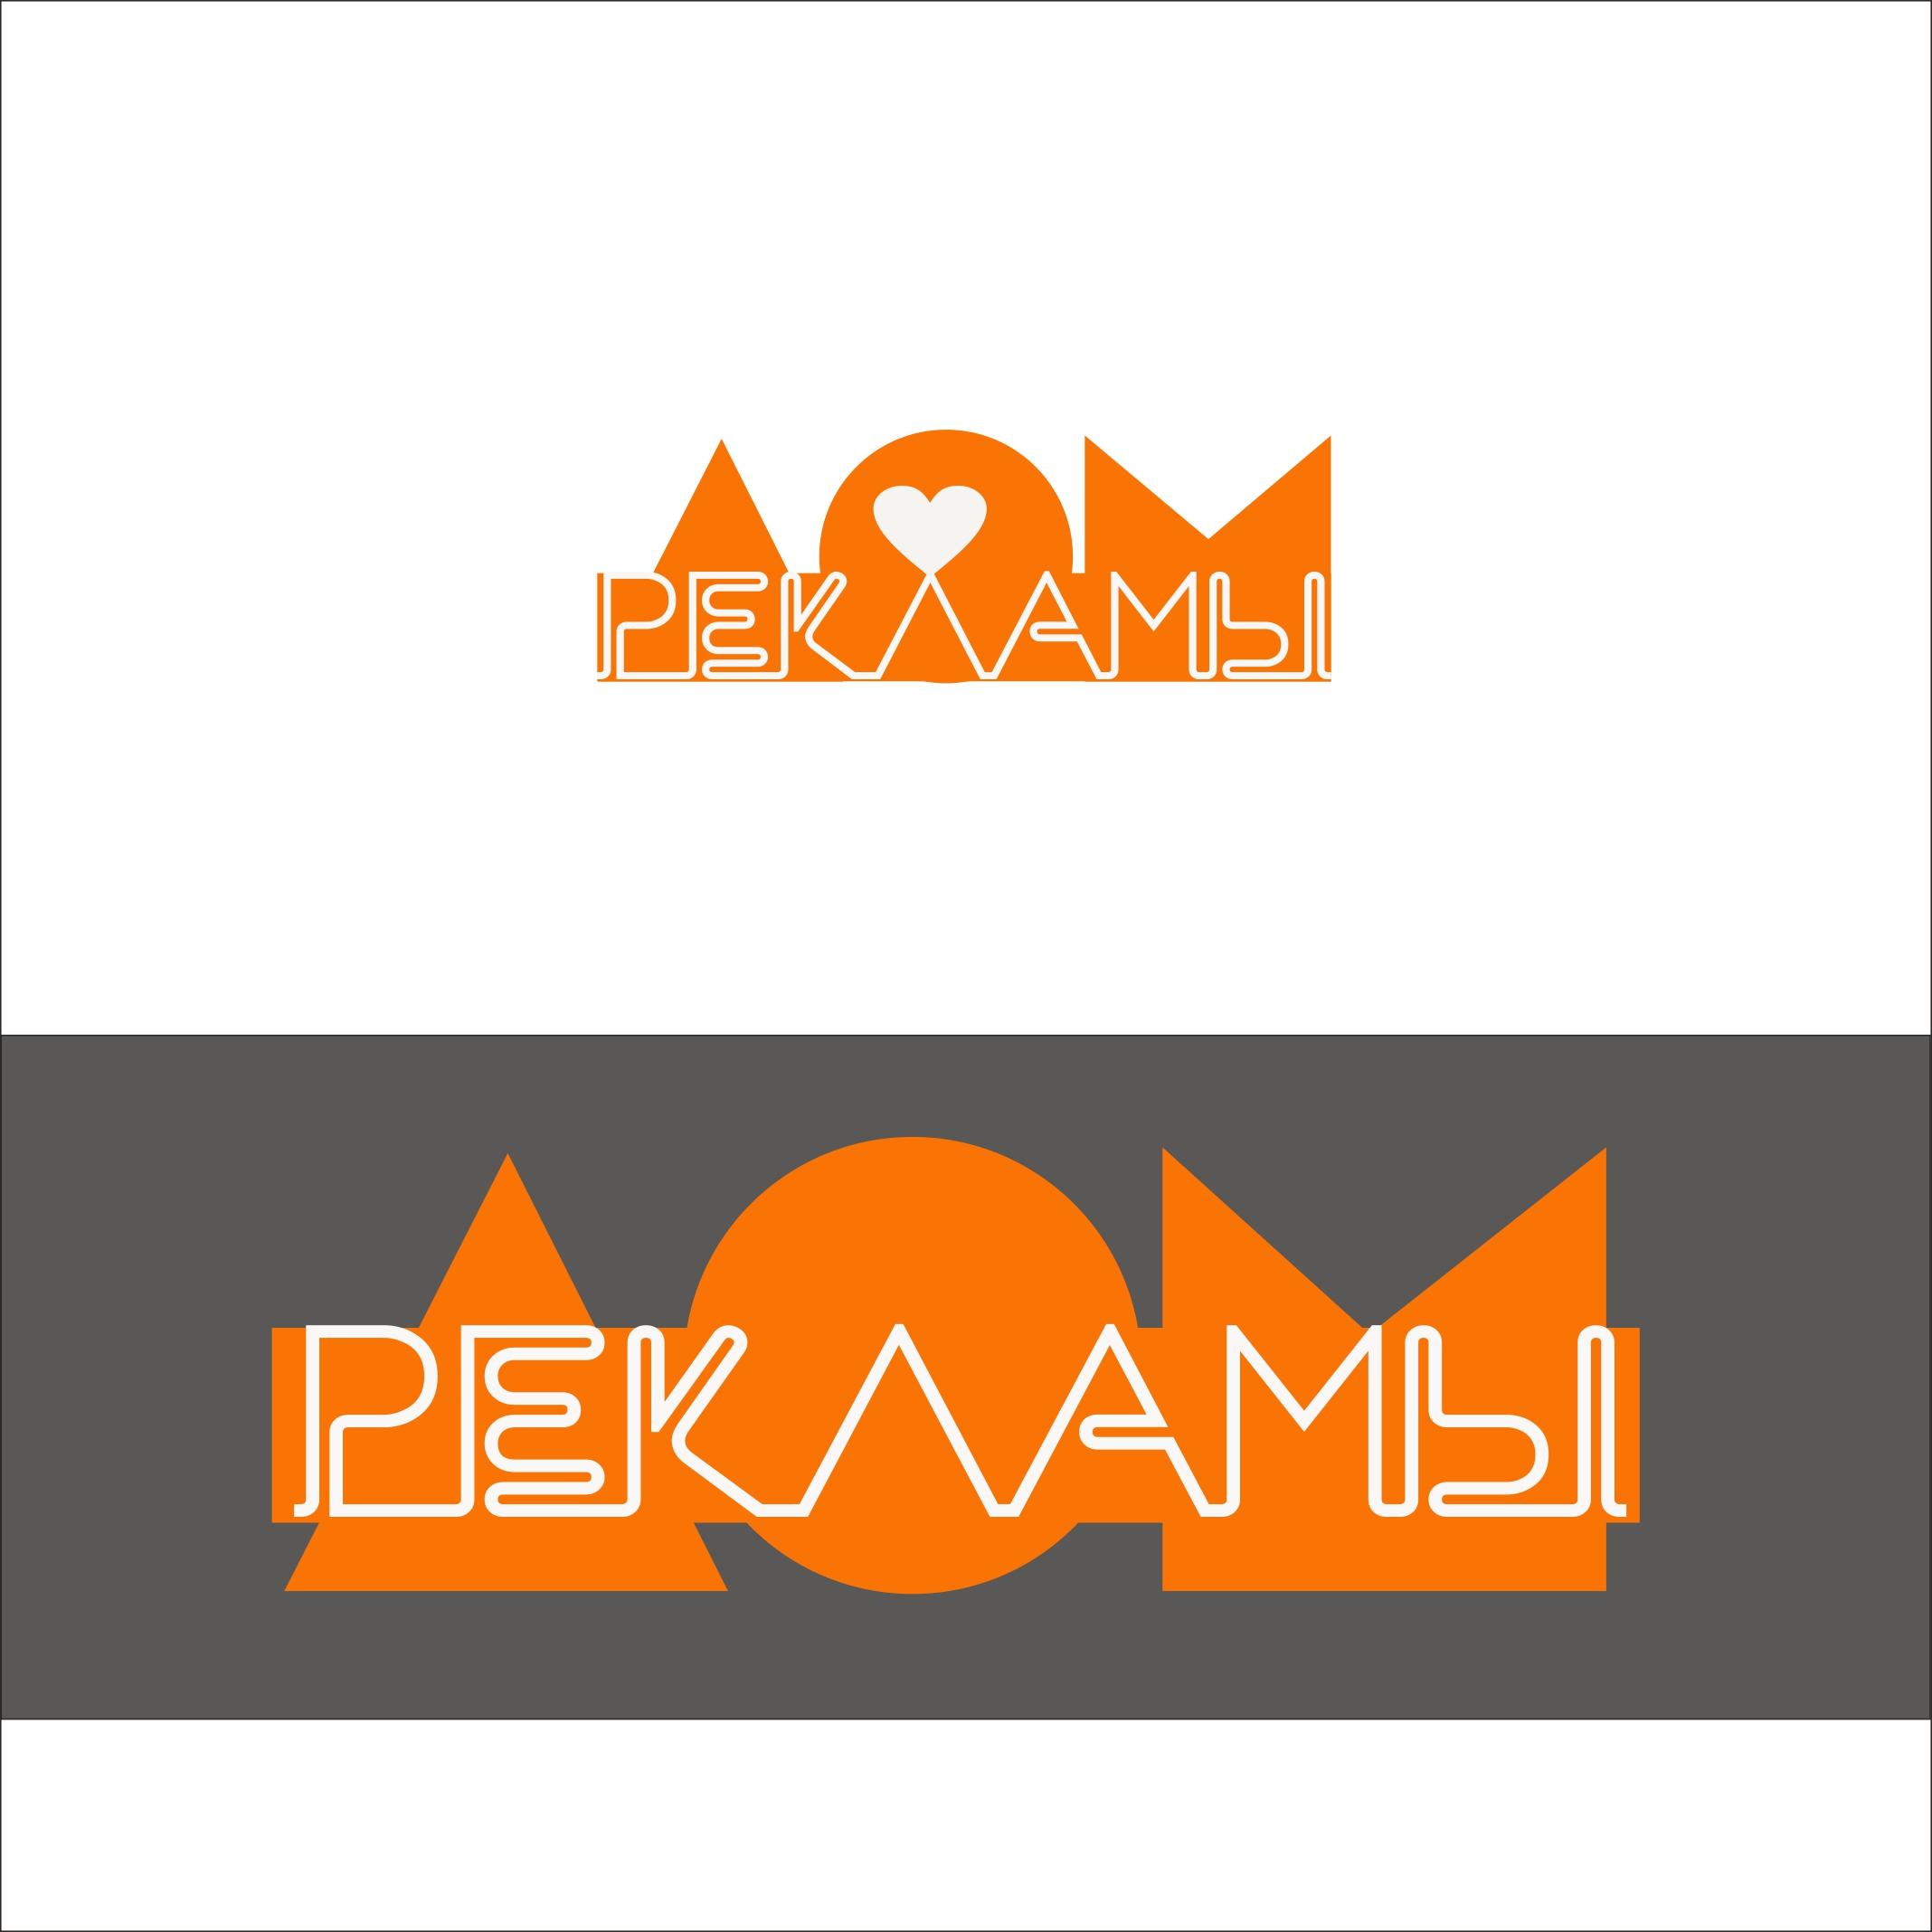 Дизайн логотипа рекламно-производственной компании фото f_8095edd9e34dcad1.jpg